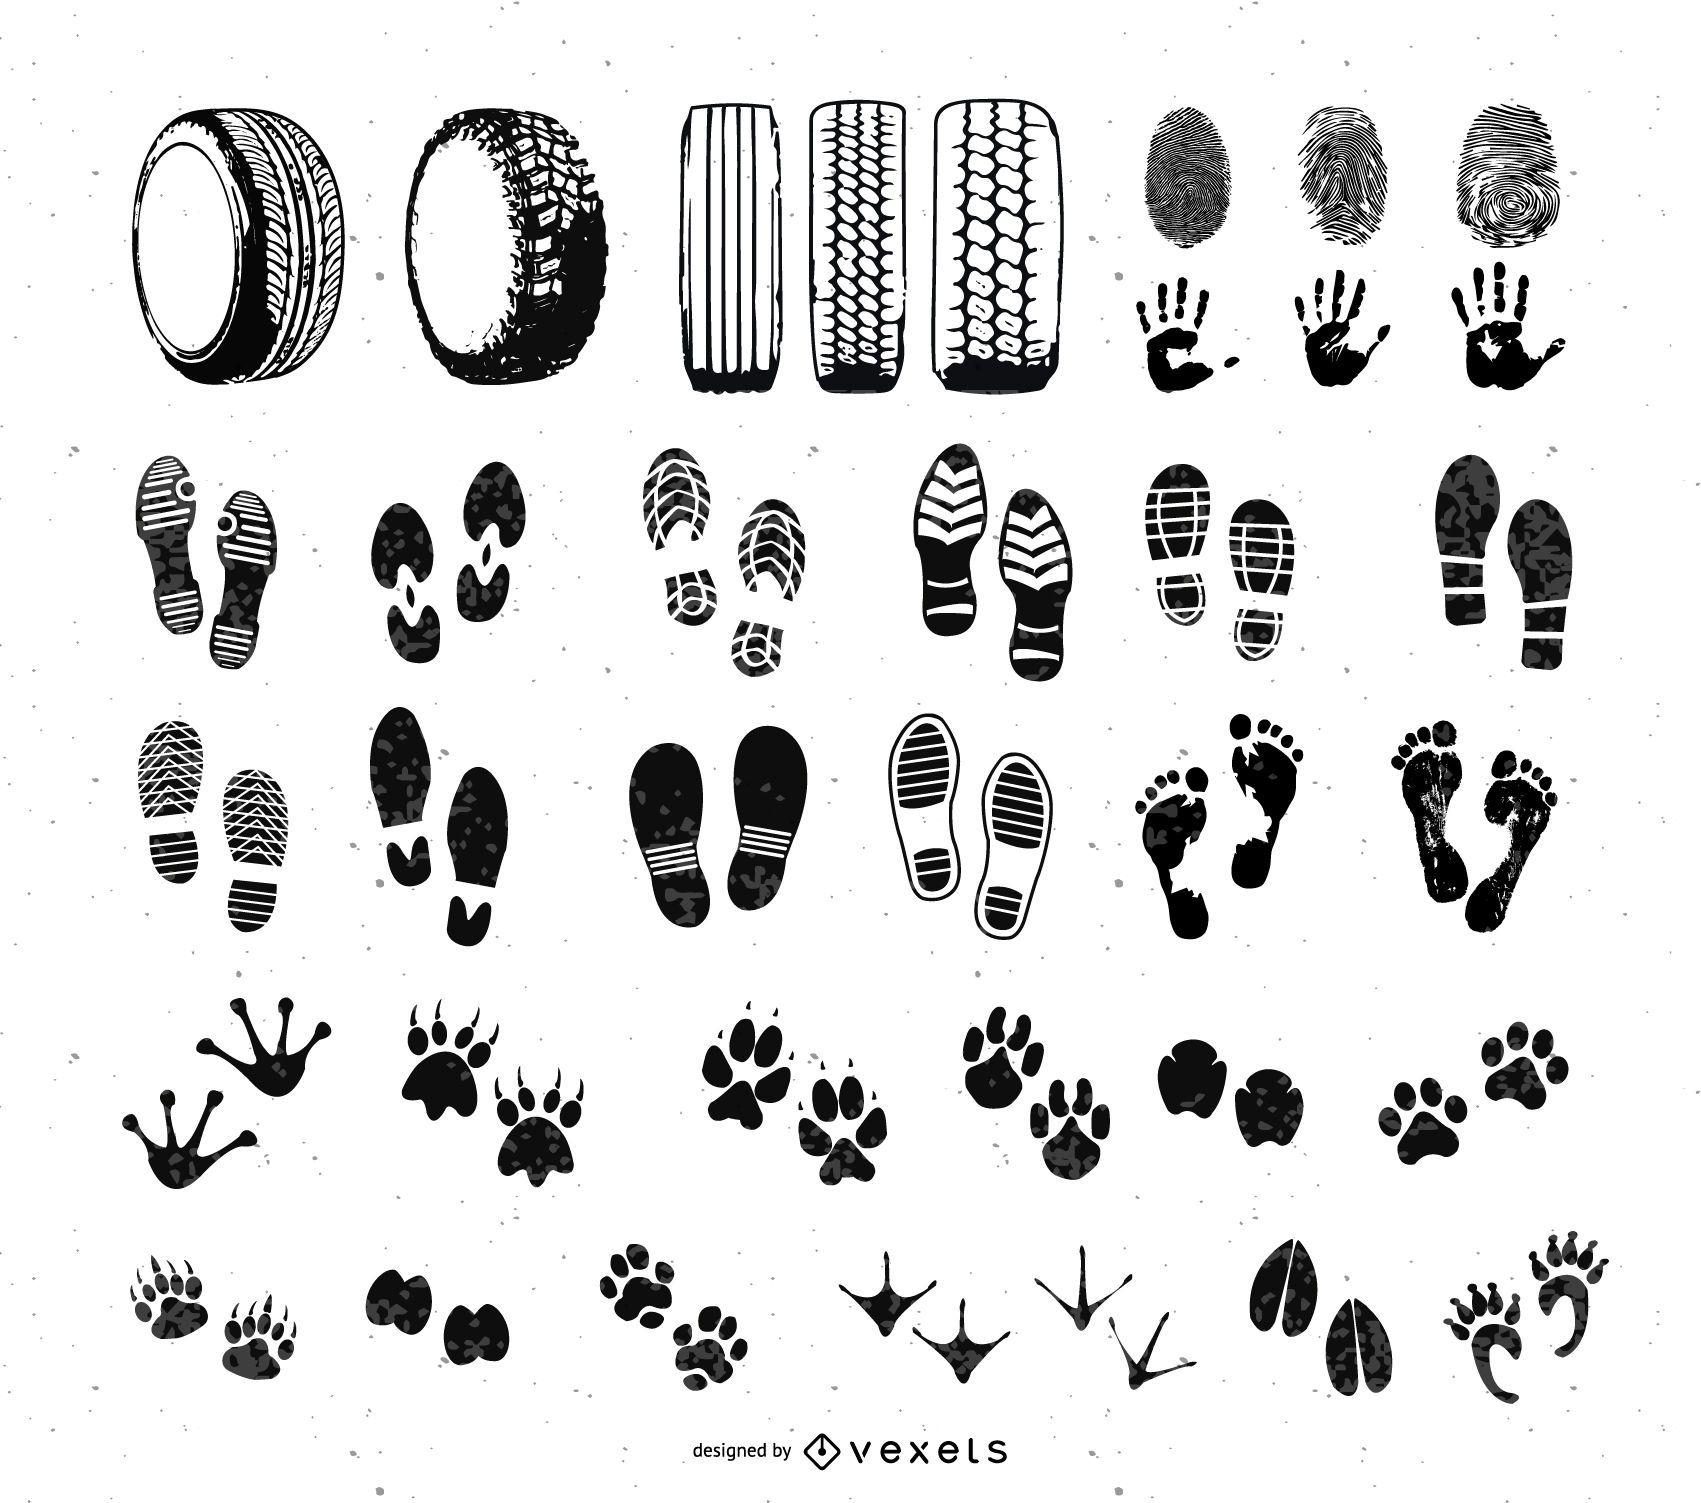 Foot and Car Wheel Step Print Set